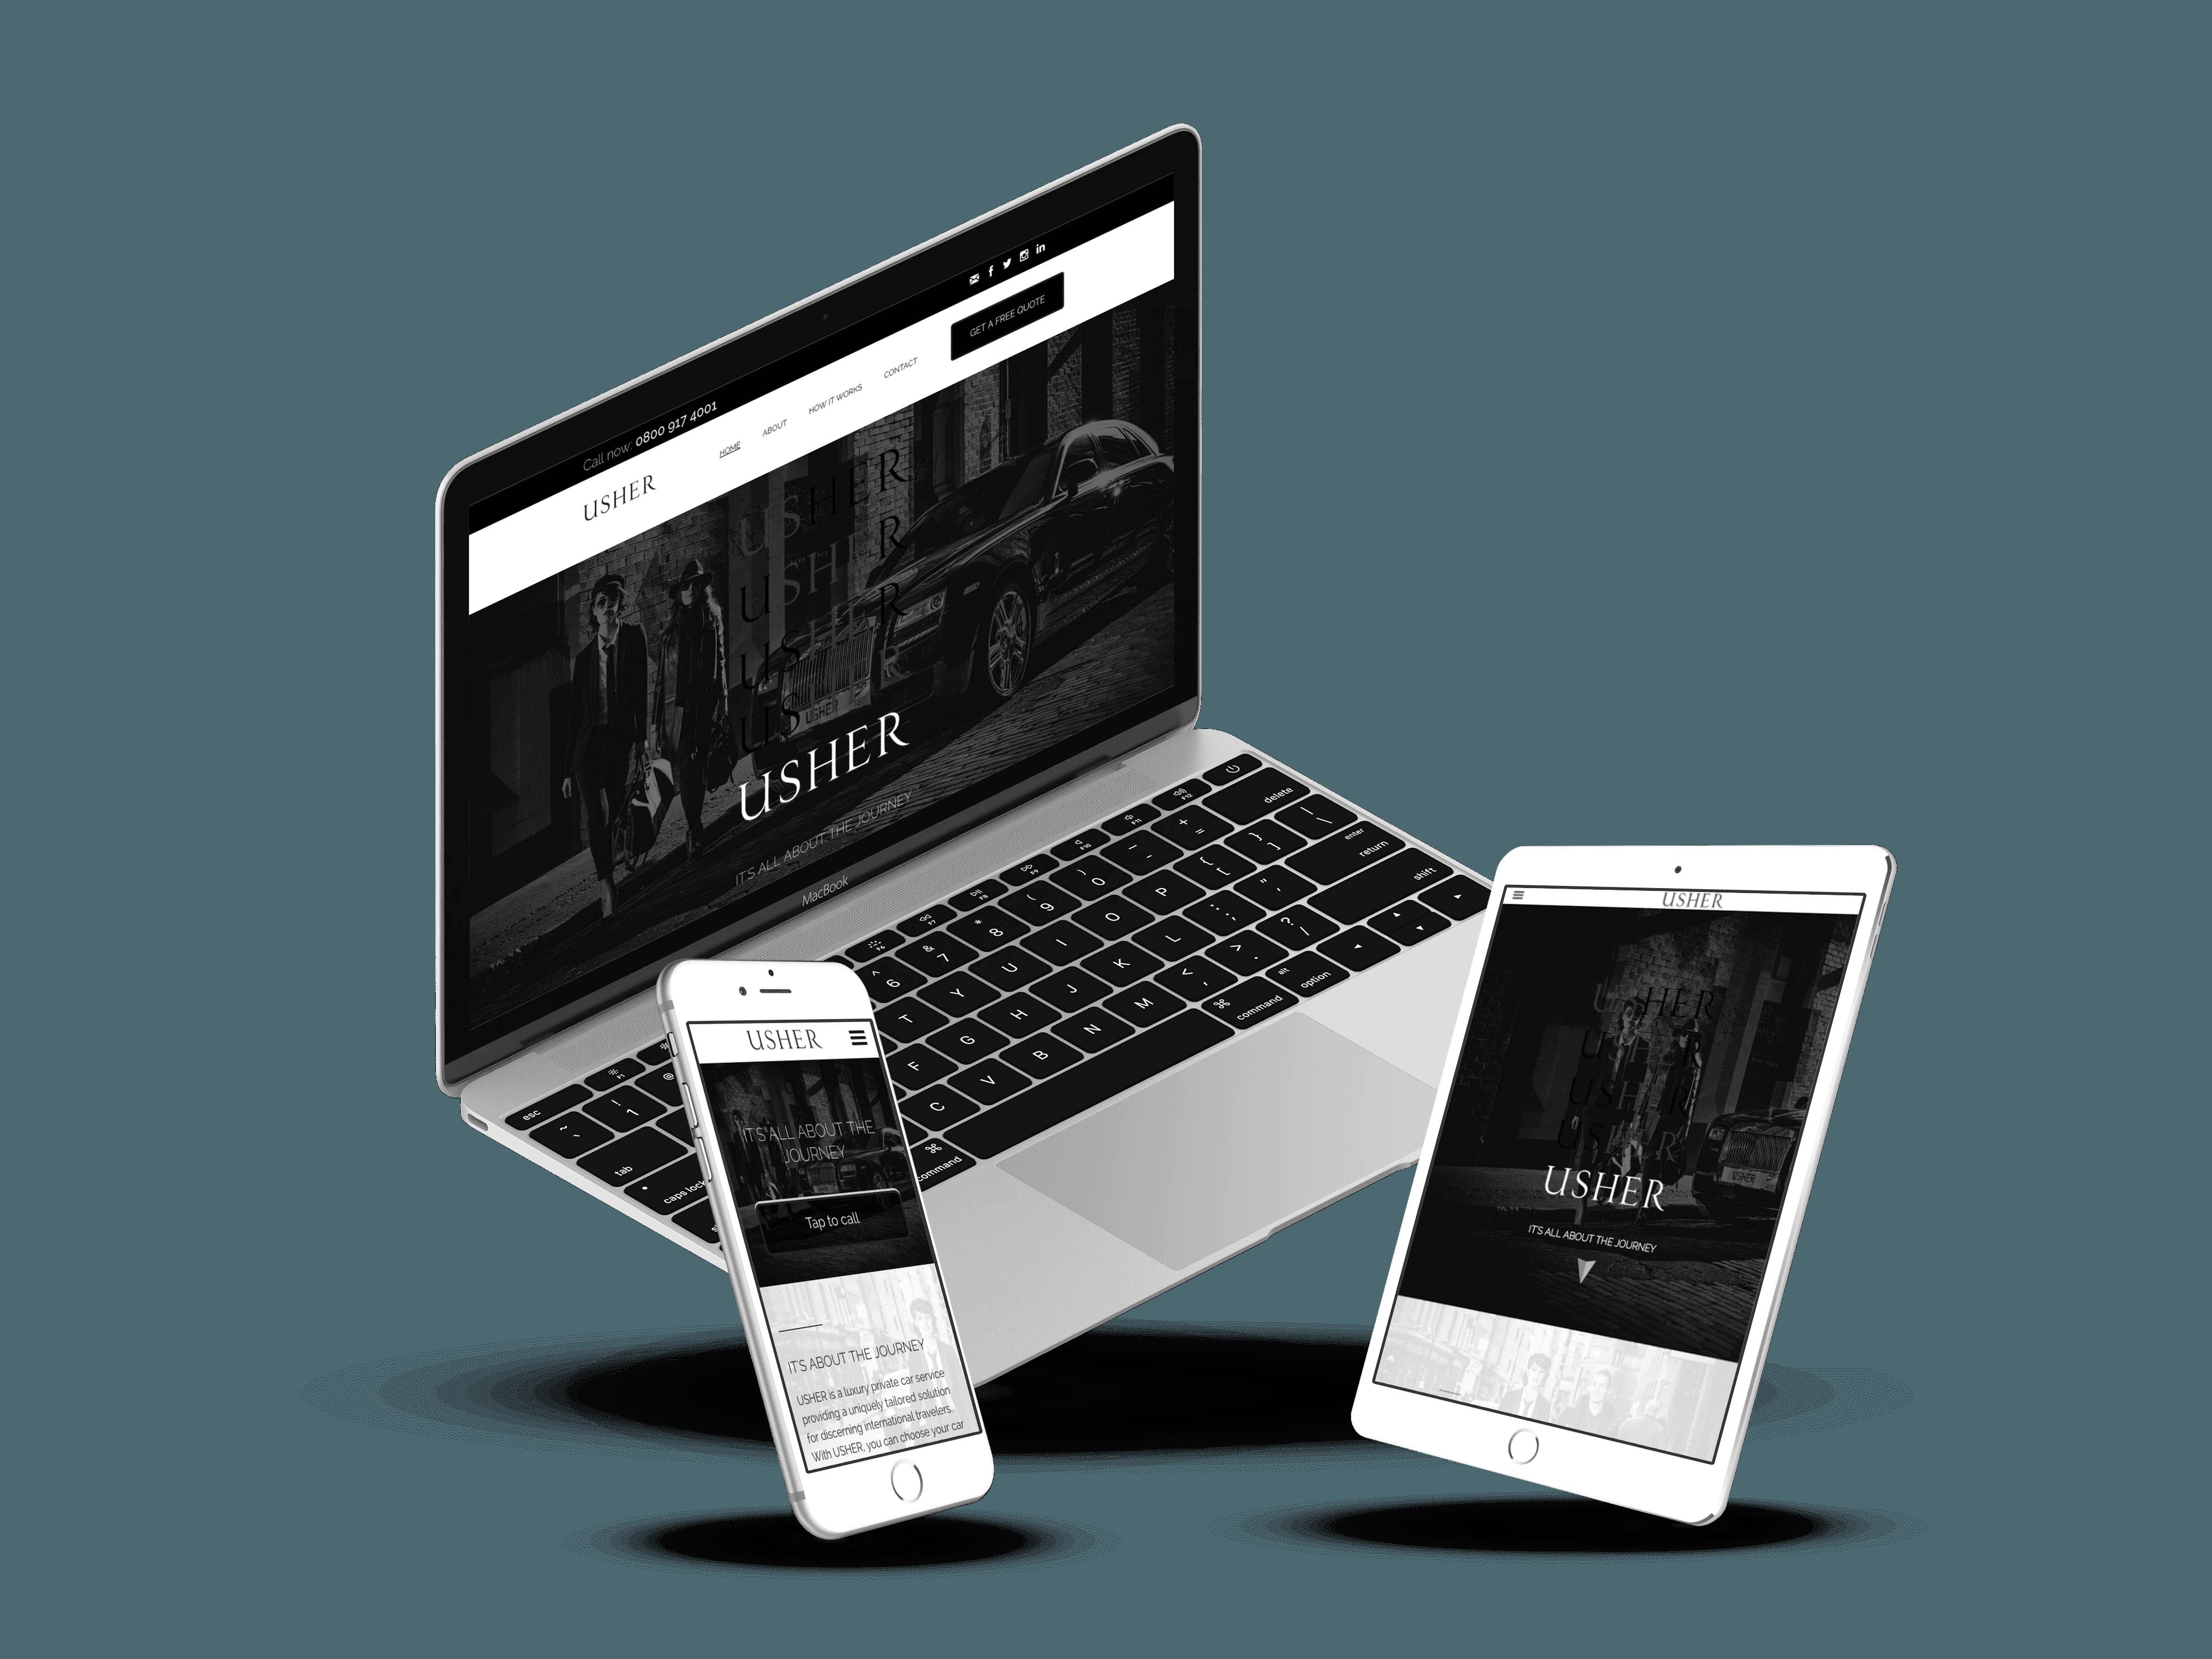 Usher website design